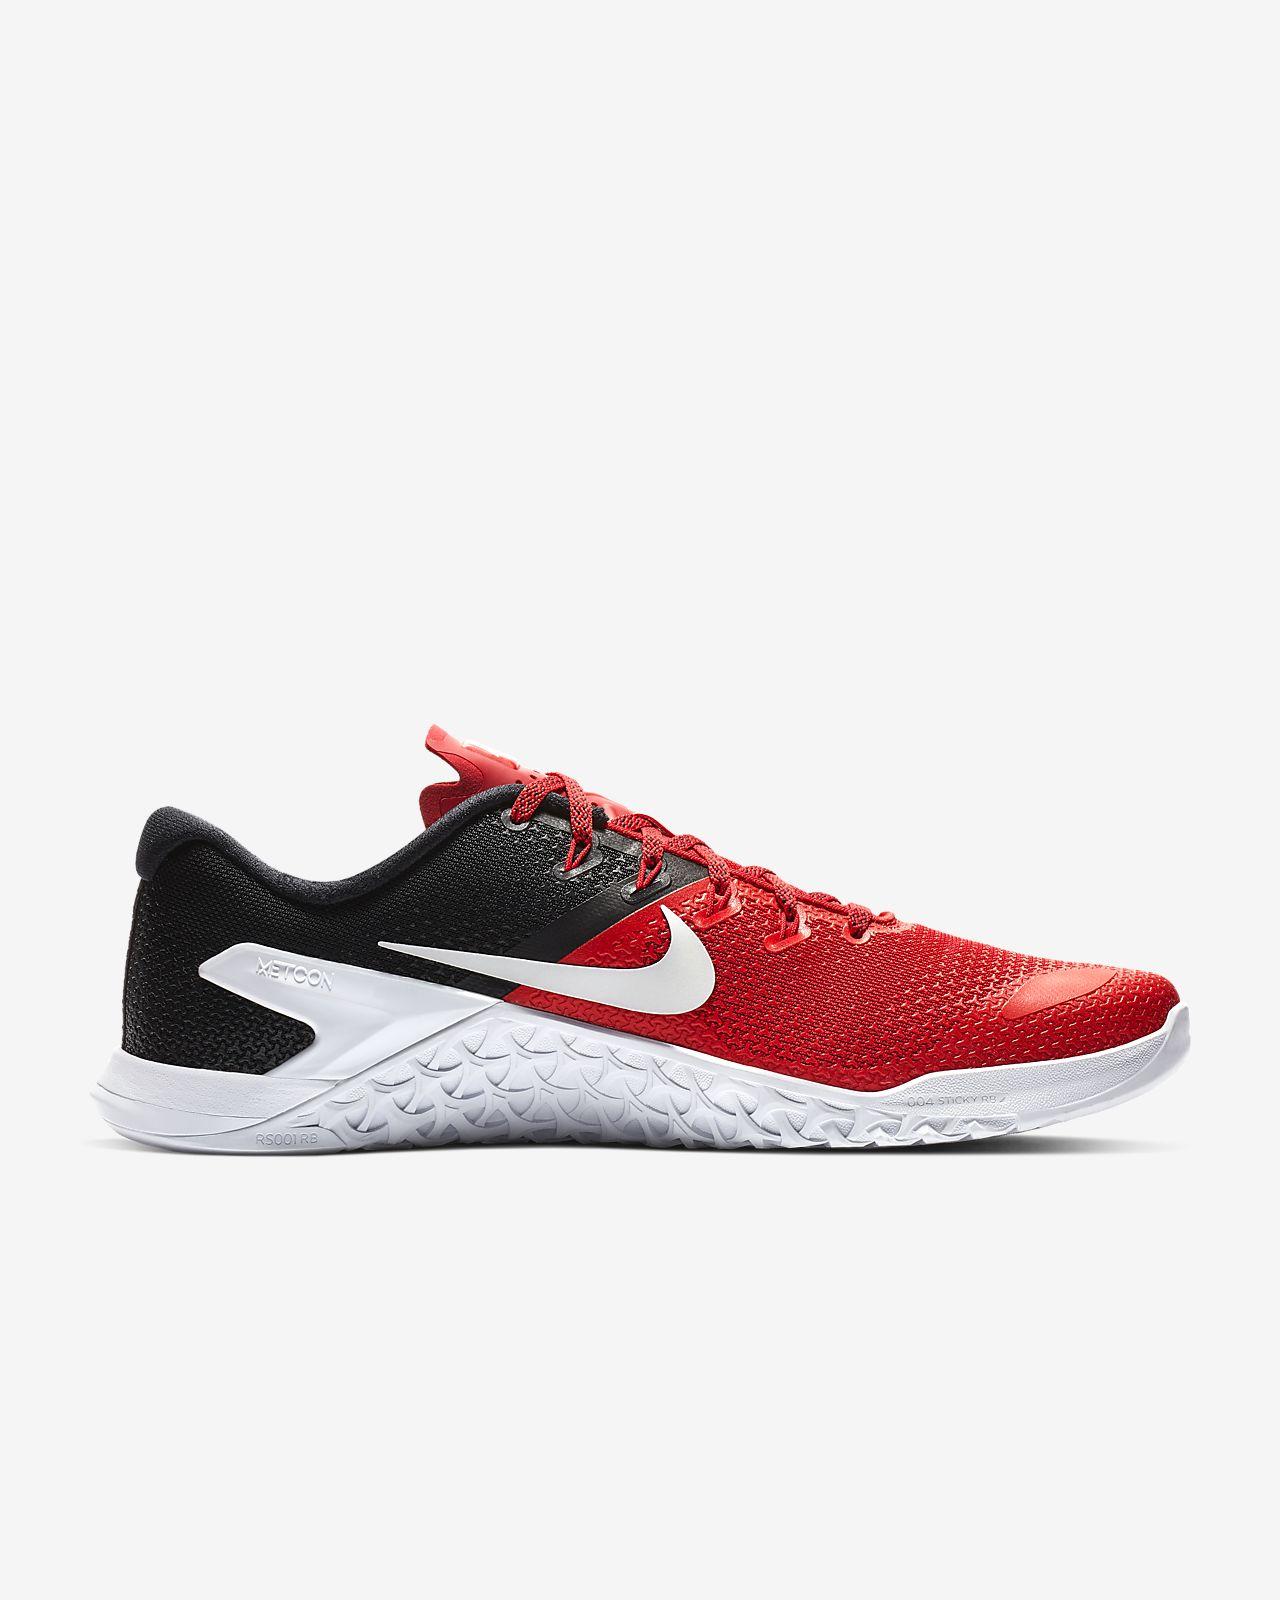 87422501a674 Nike Metcon 4 Men s Cross Training Weightlifting Shoe. Nike.com IE